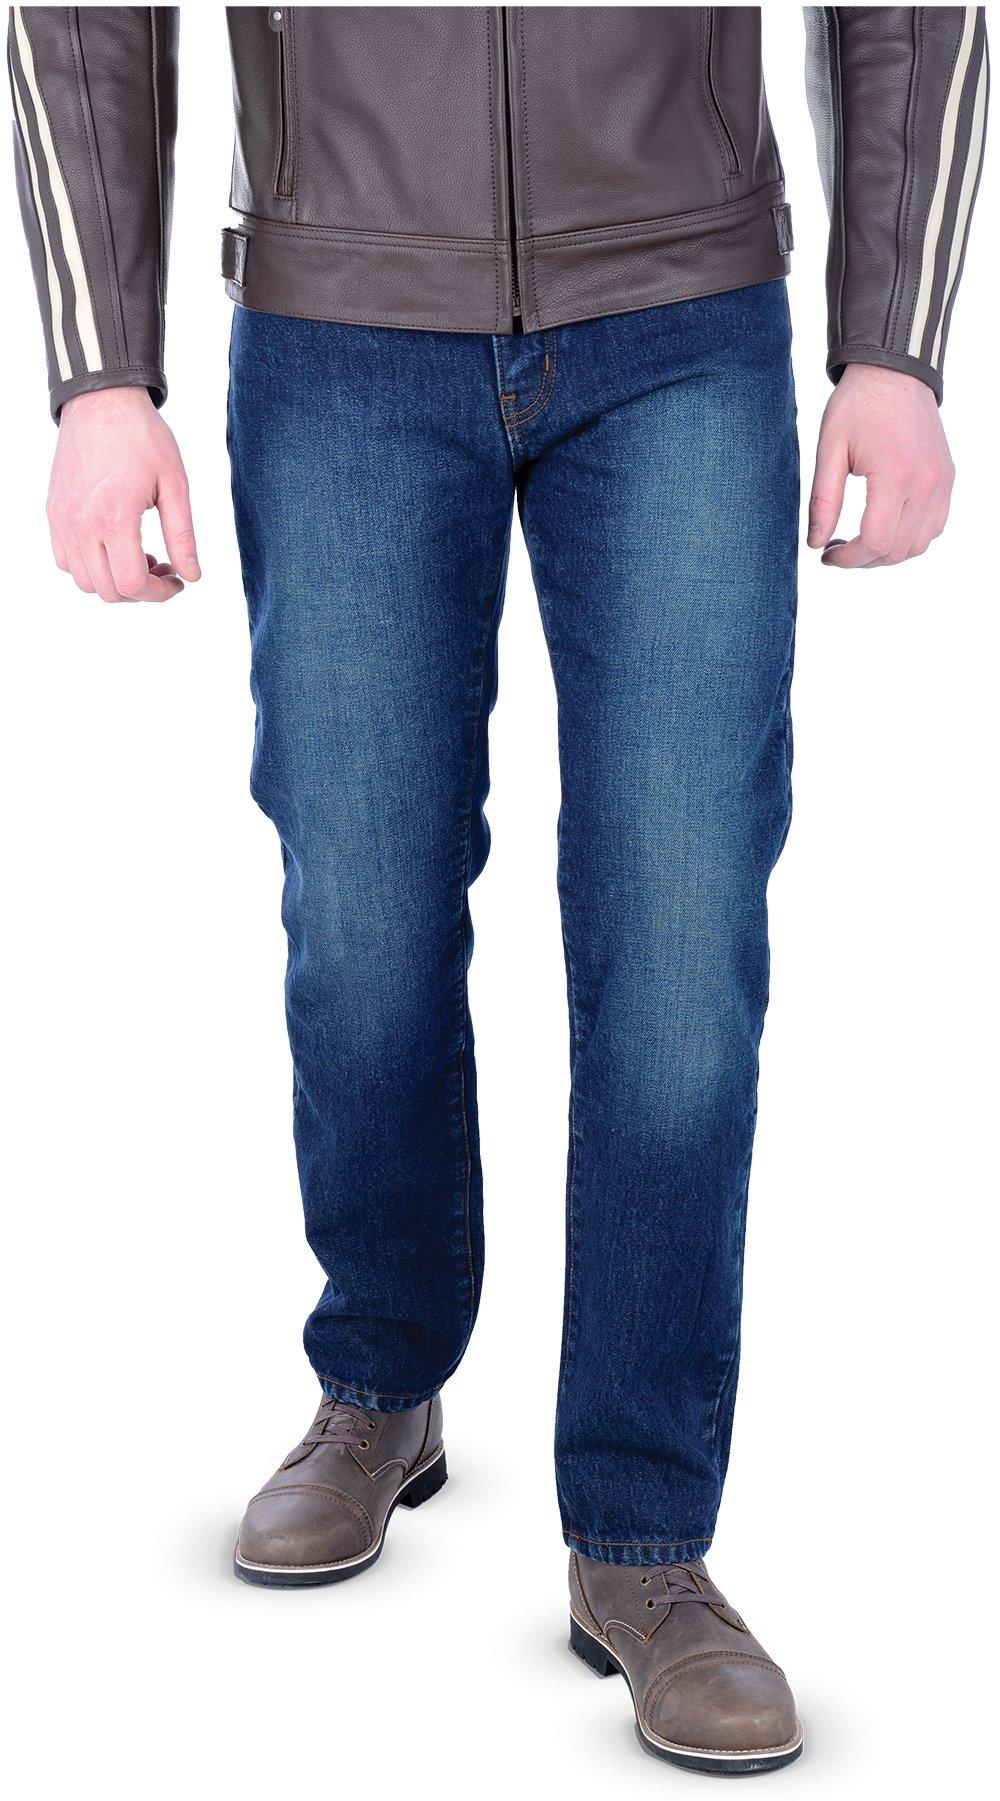 barton-lifestyle Barton Jeans